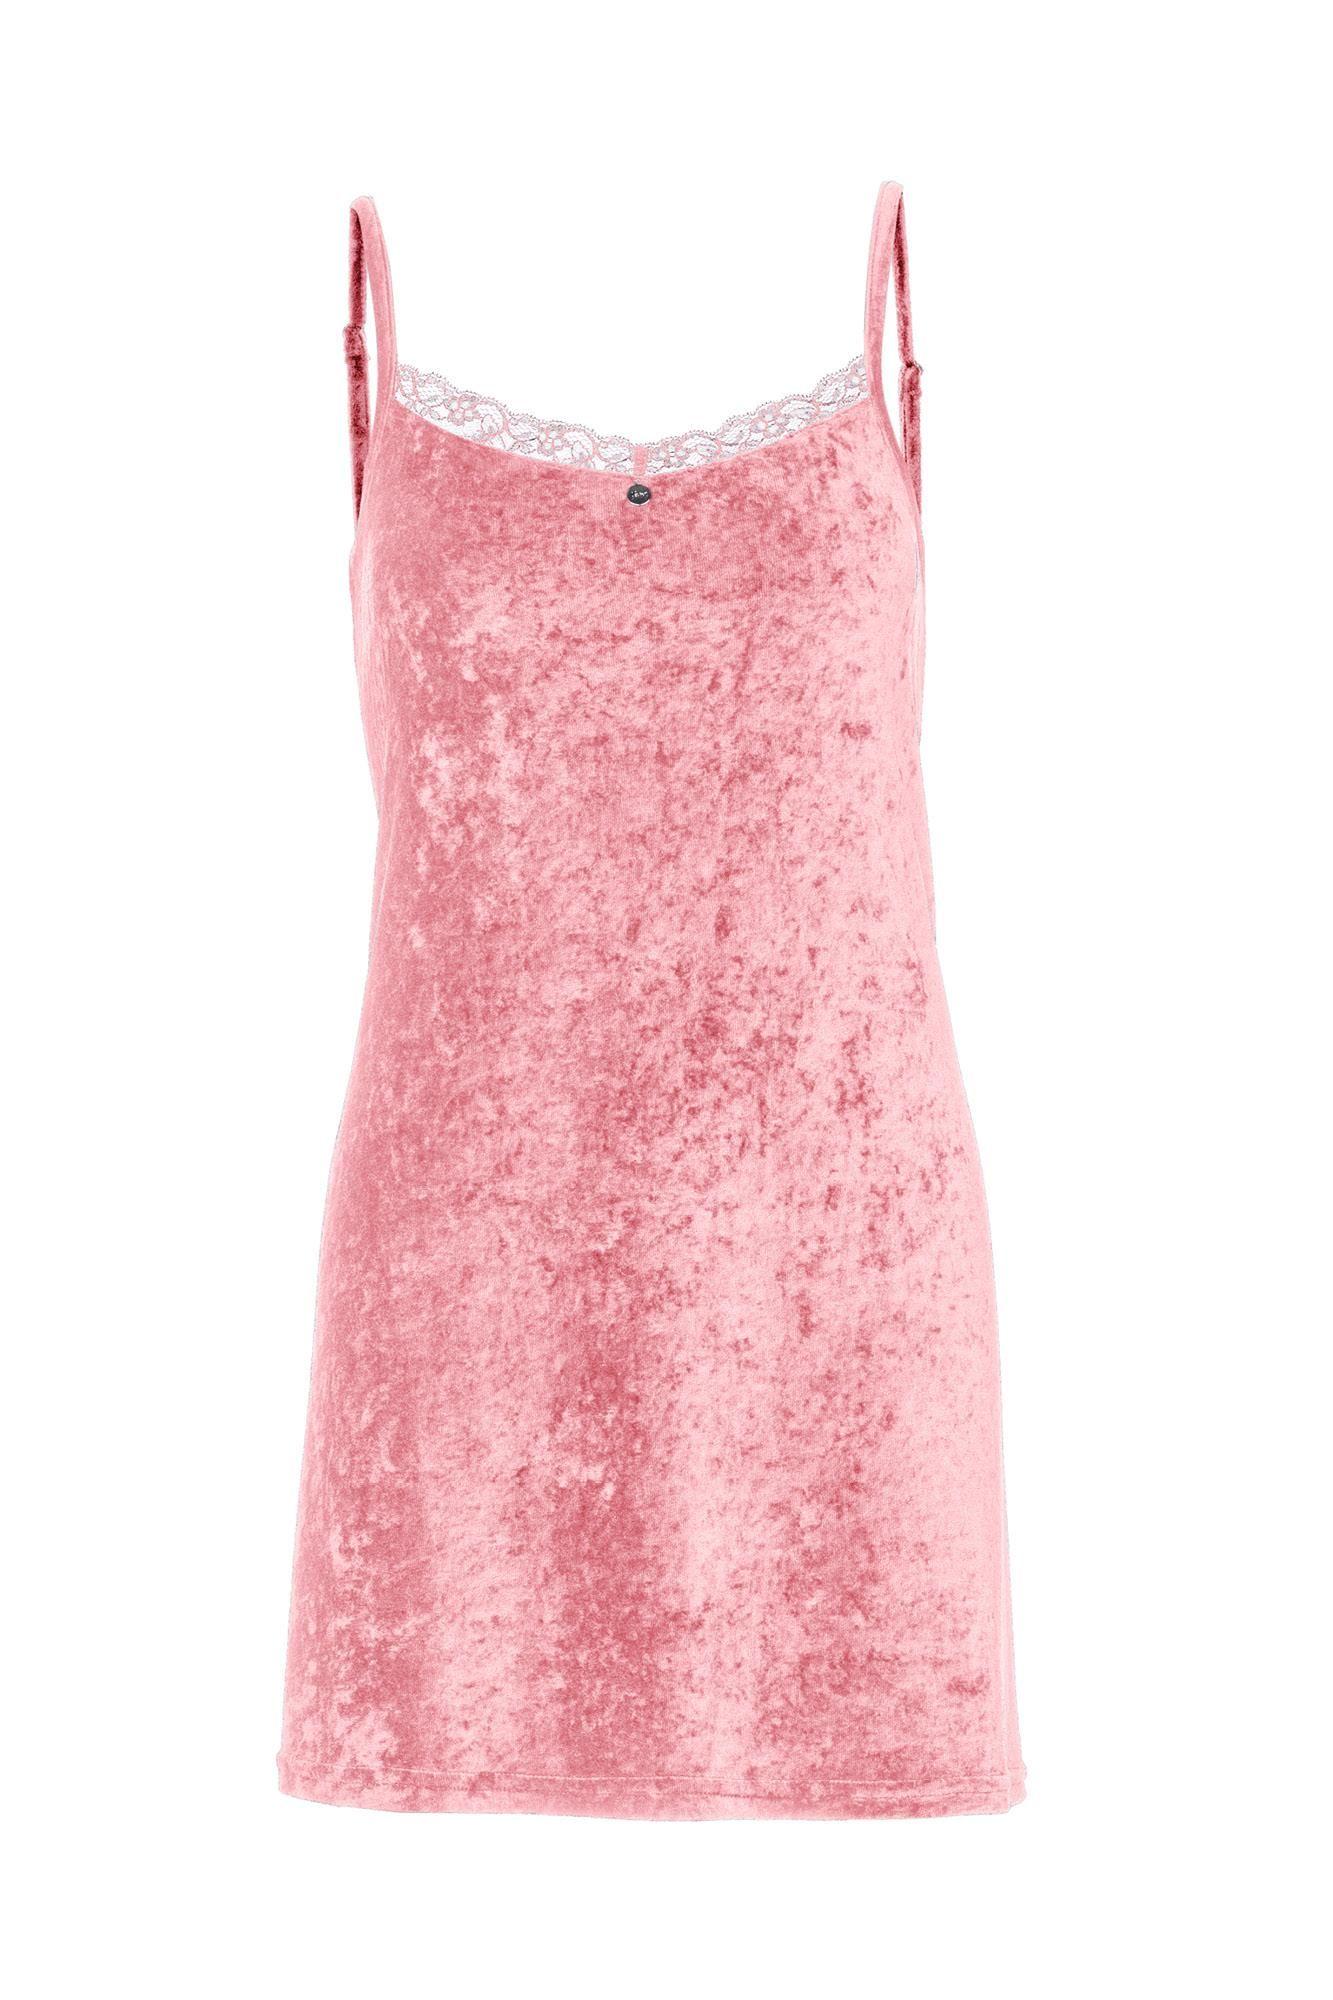 Women's Velour Sleeveless Nightgown